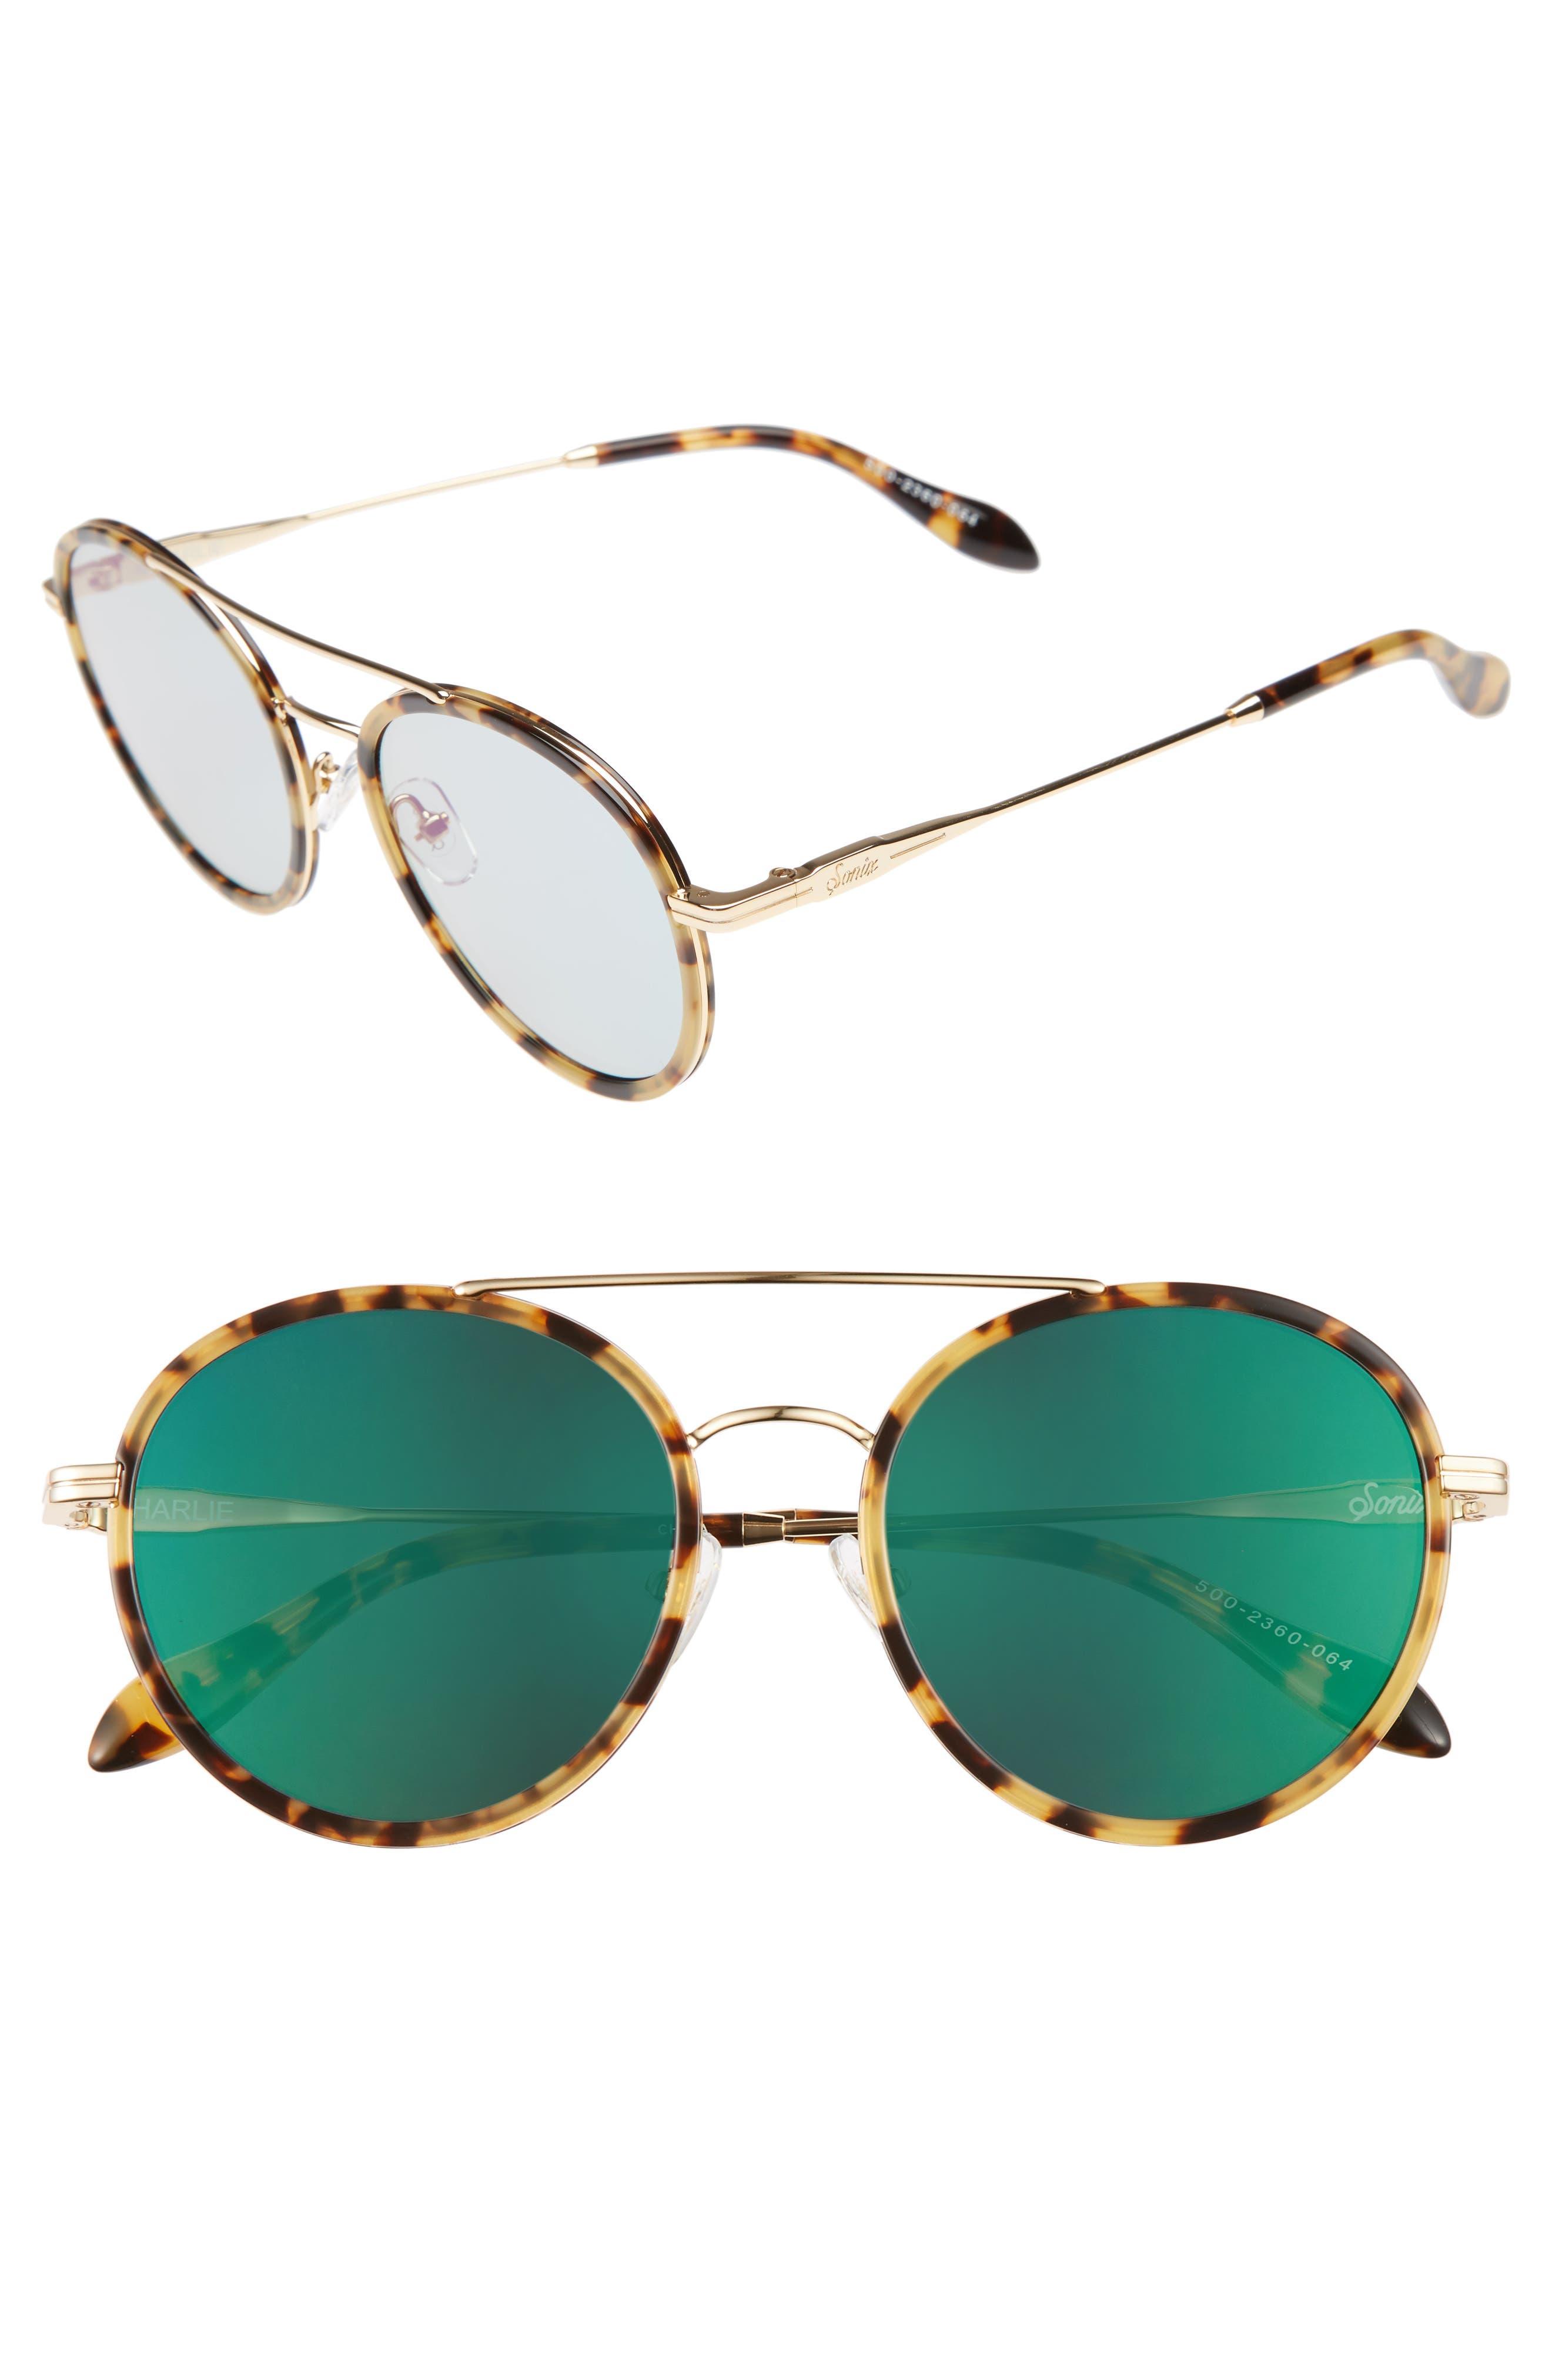 Charli 50mm Mirrored Lens Round Sunglasses,                             Main thumbnail 3, color,